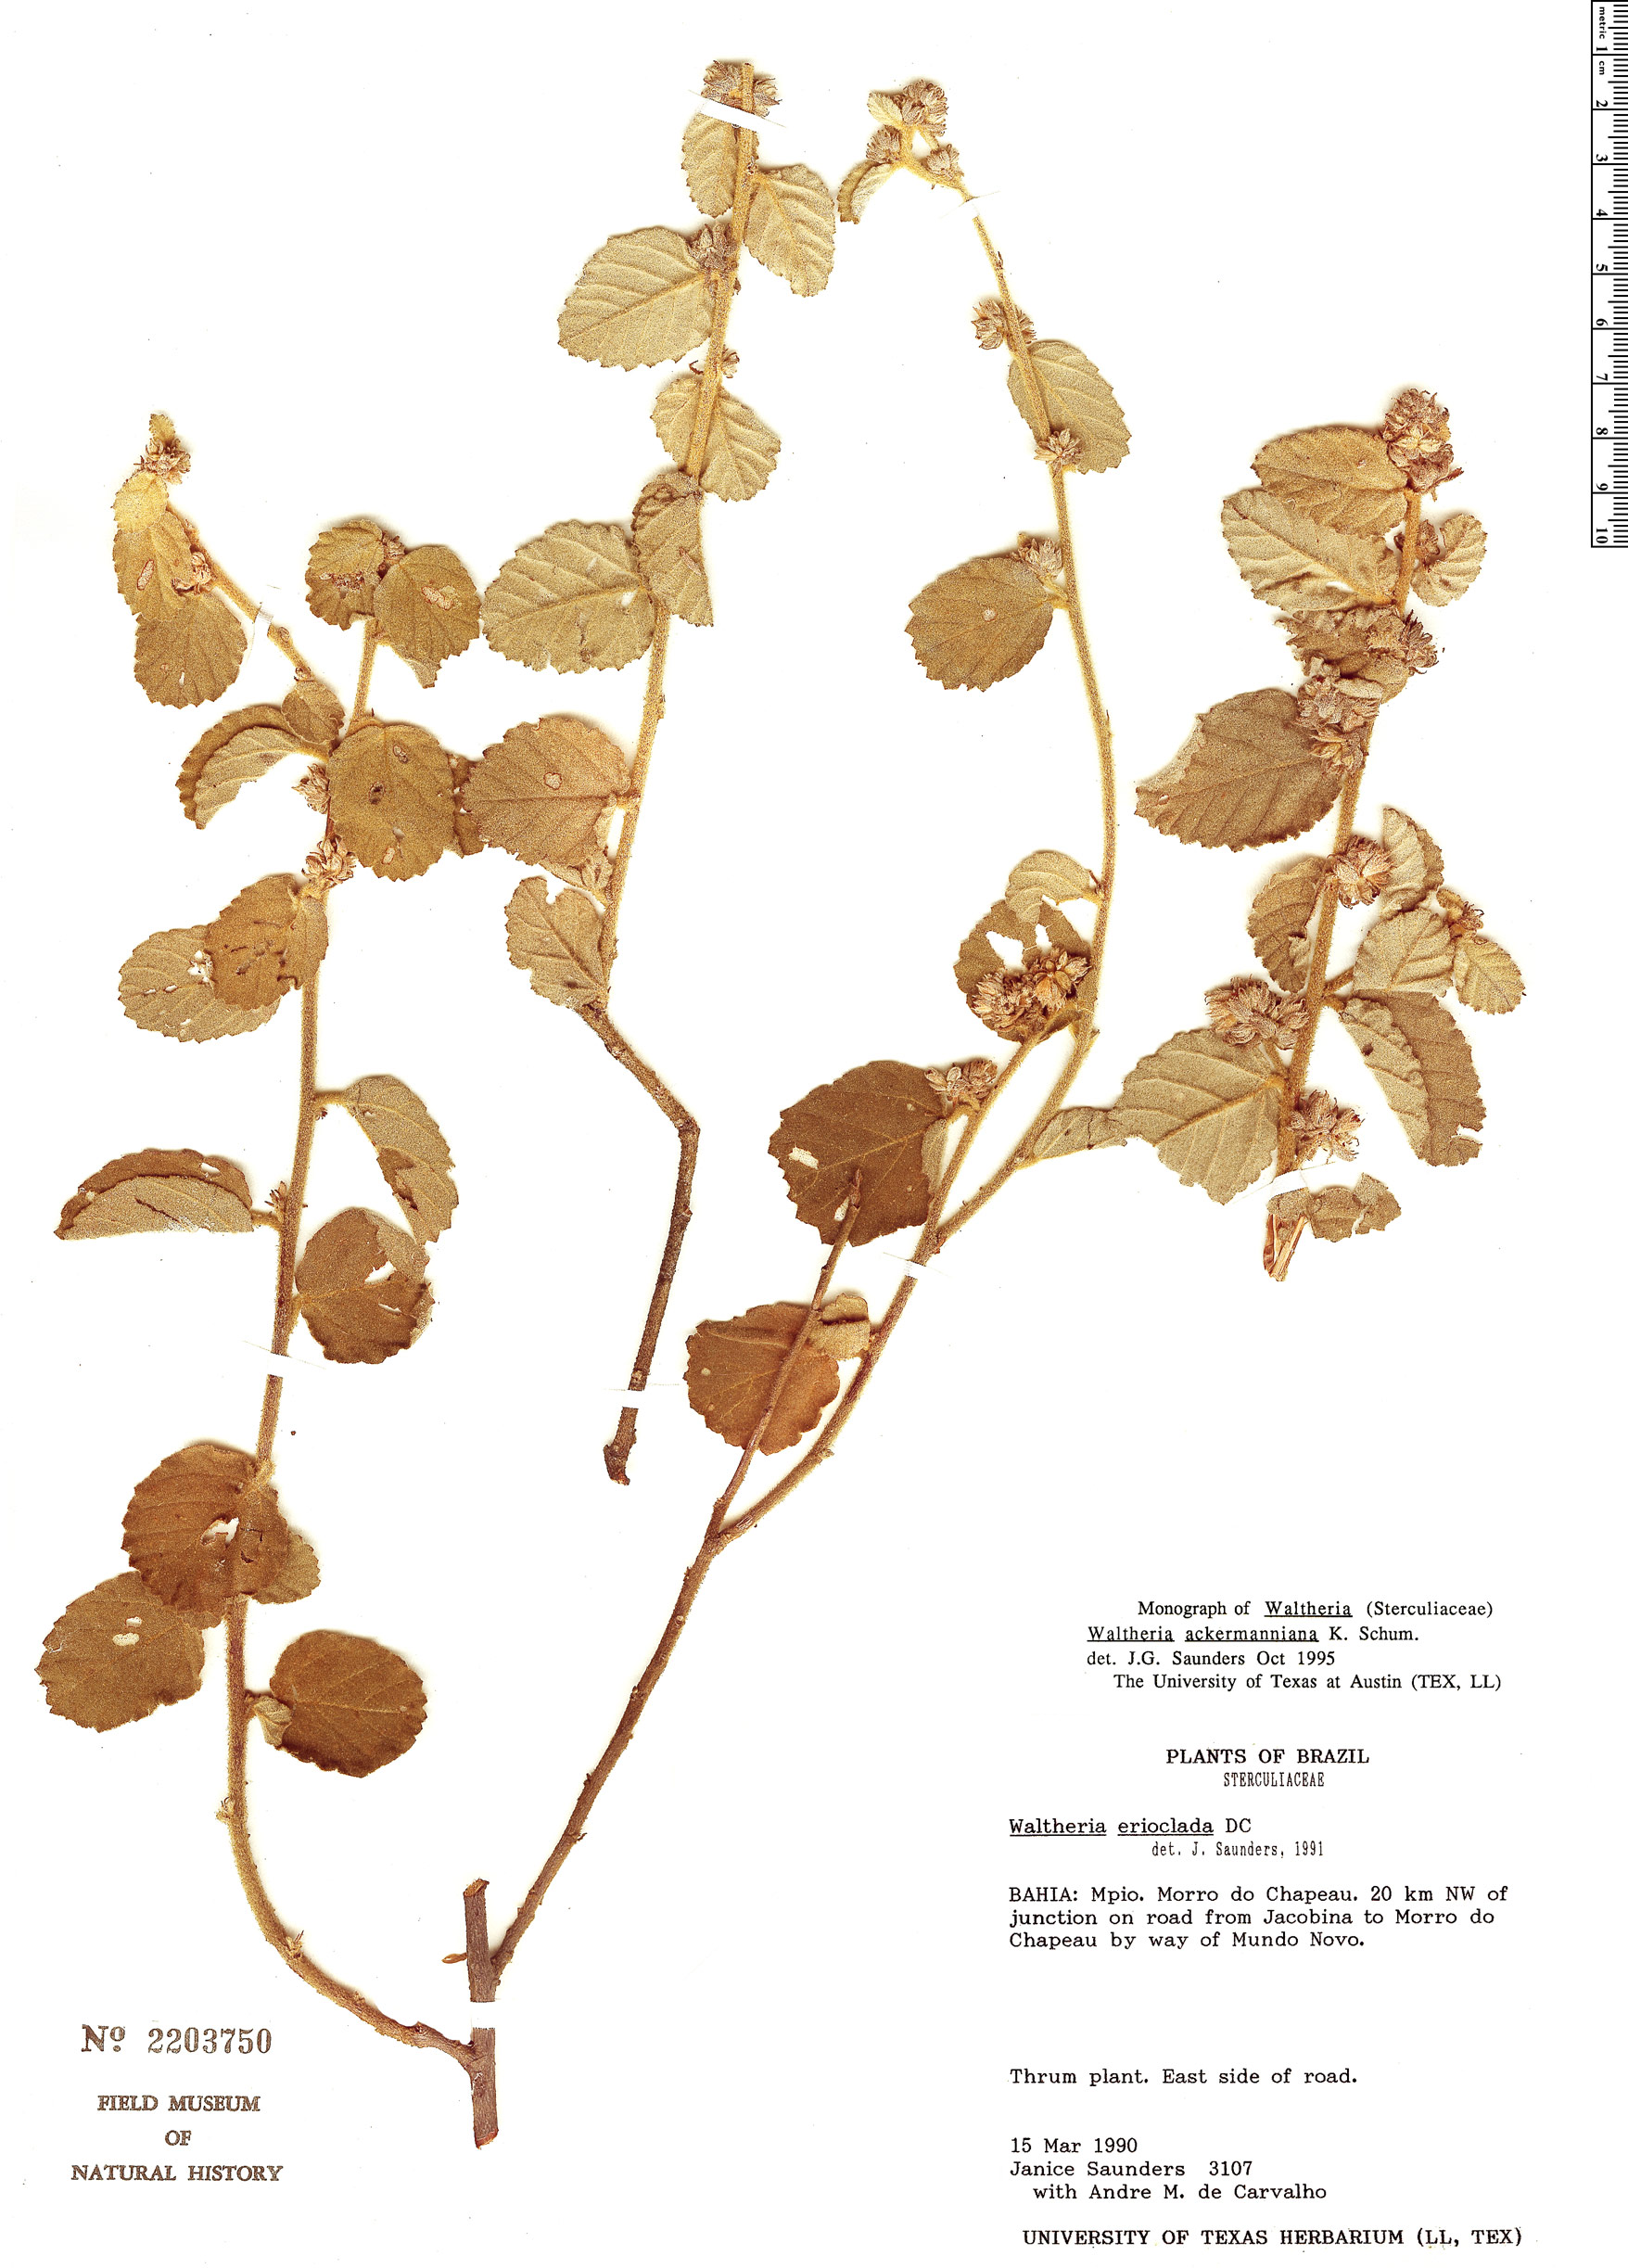 Espécime: Waltheria ackermanniana